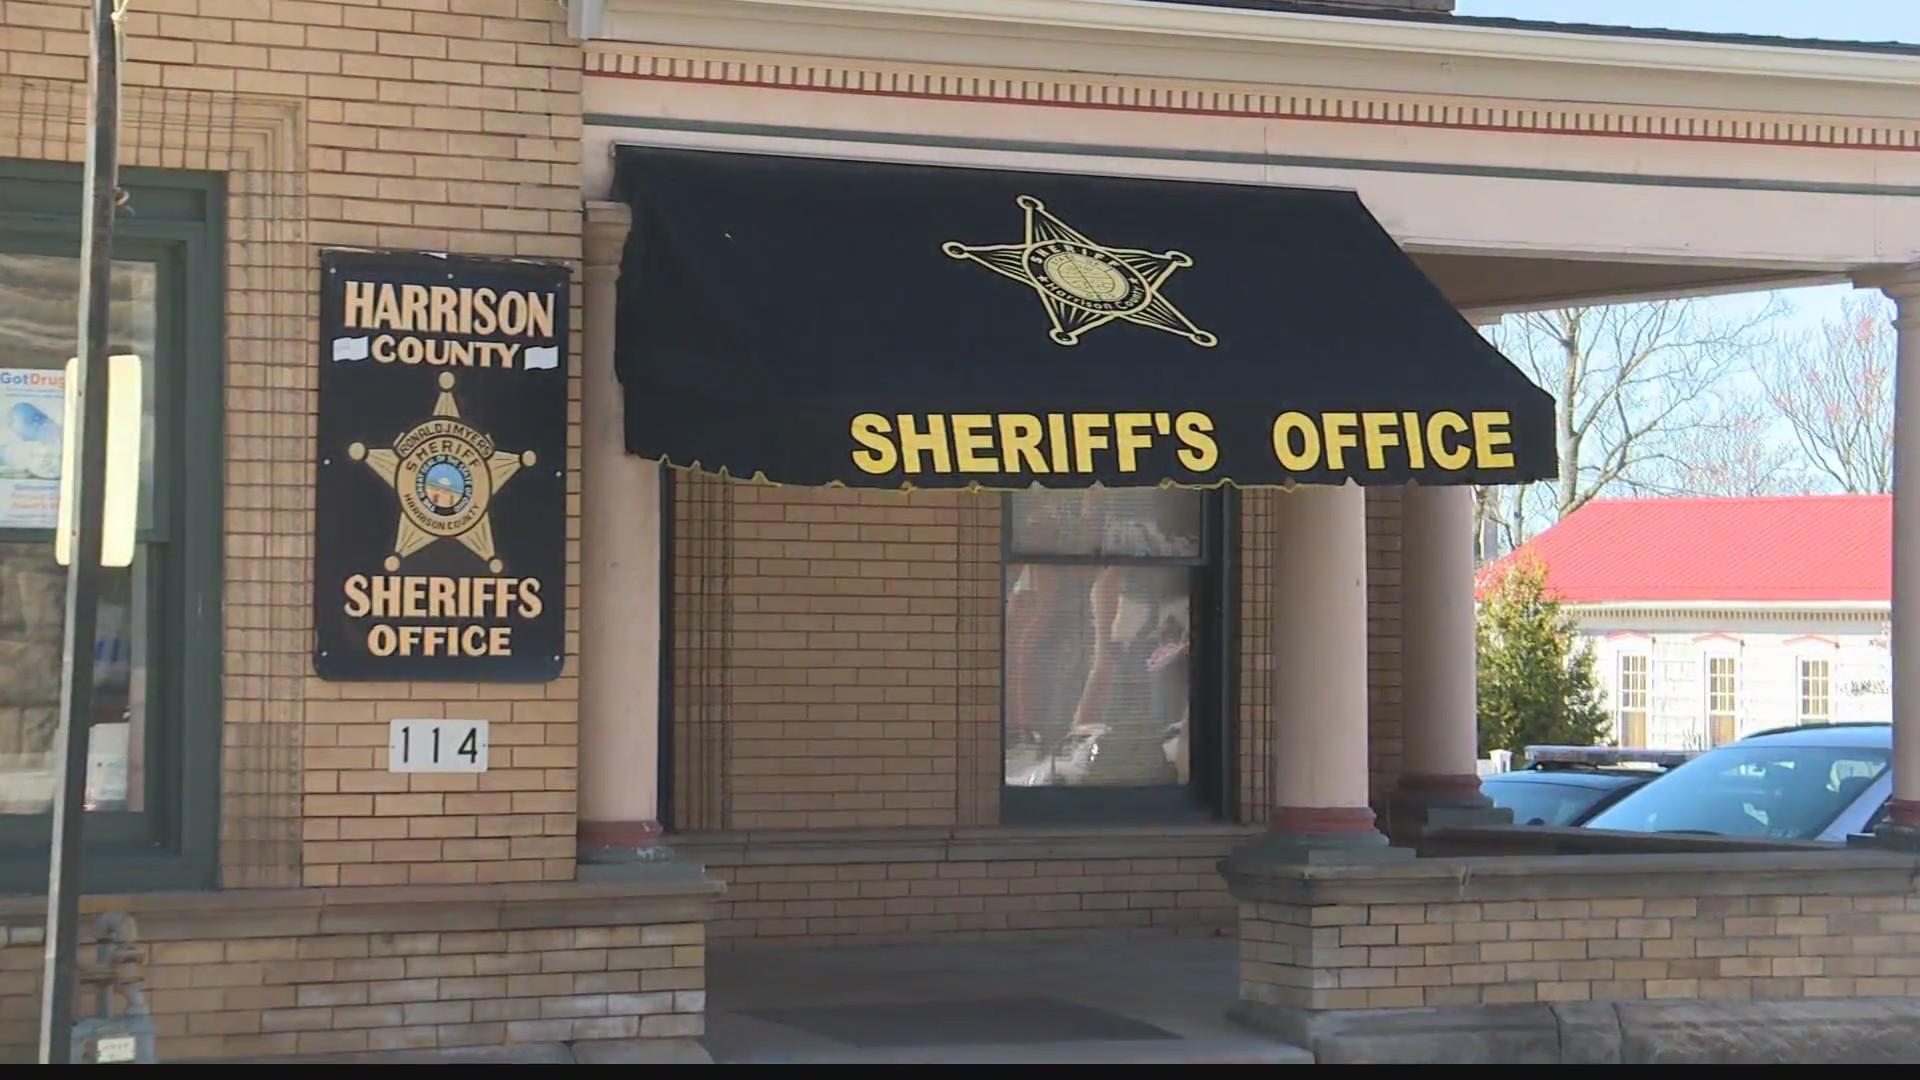 Cadiz Ohio 2020 Christmas Parade Harrison County deputy arrest Cadiz man on felony drug charges | WTRF